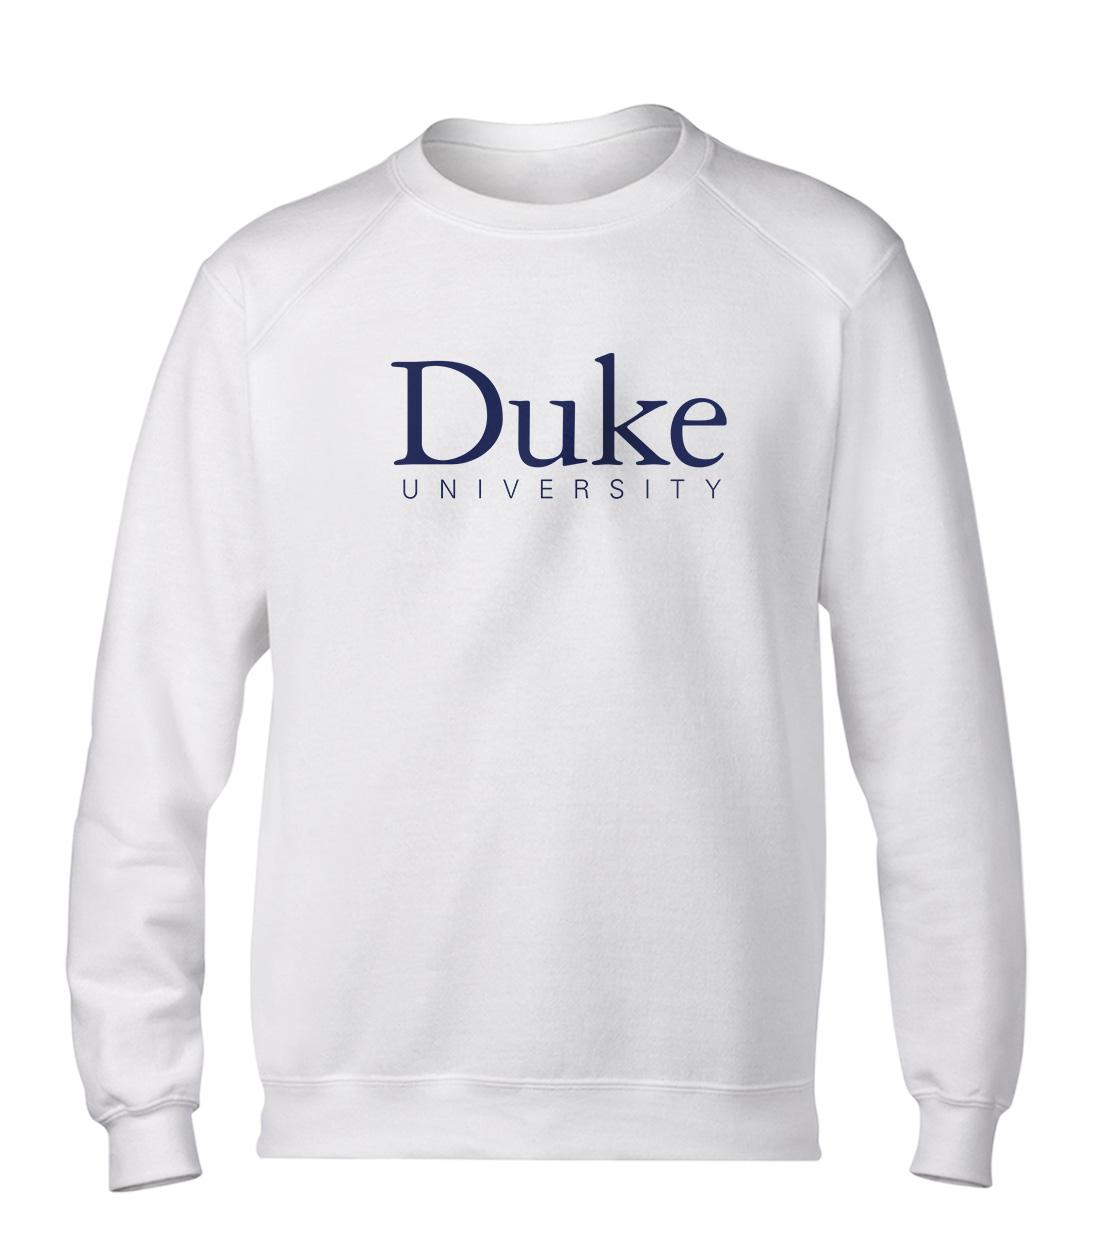 Duke University Basic (BSC-WHT-ncaa-NP-Duke-512)